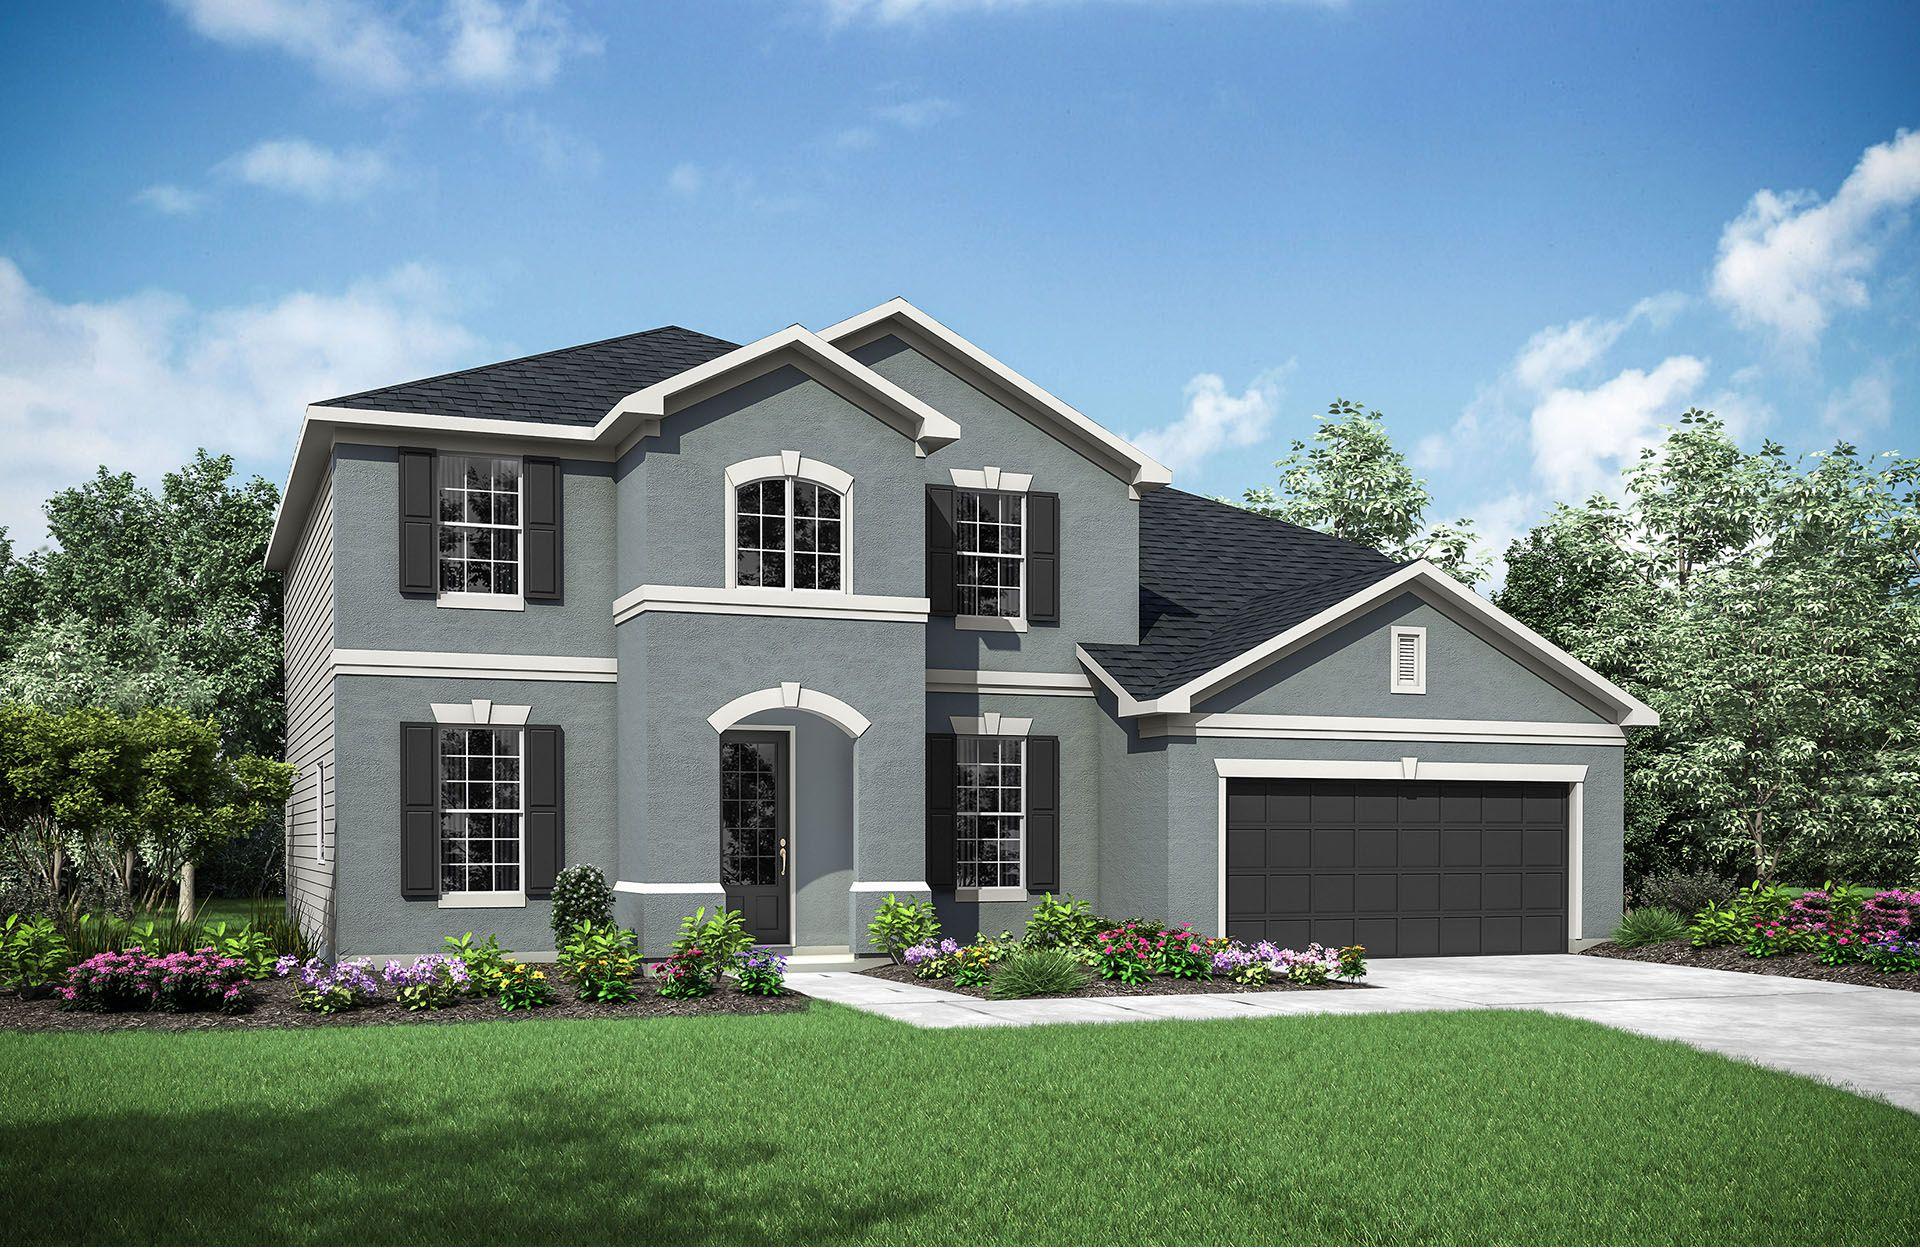 Uma única Família para Venda às Magnolia Point - Birchwood 3695 Red Hawk Ct. Green Cove Springs, Florida 32043 United States